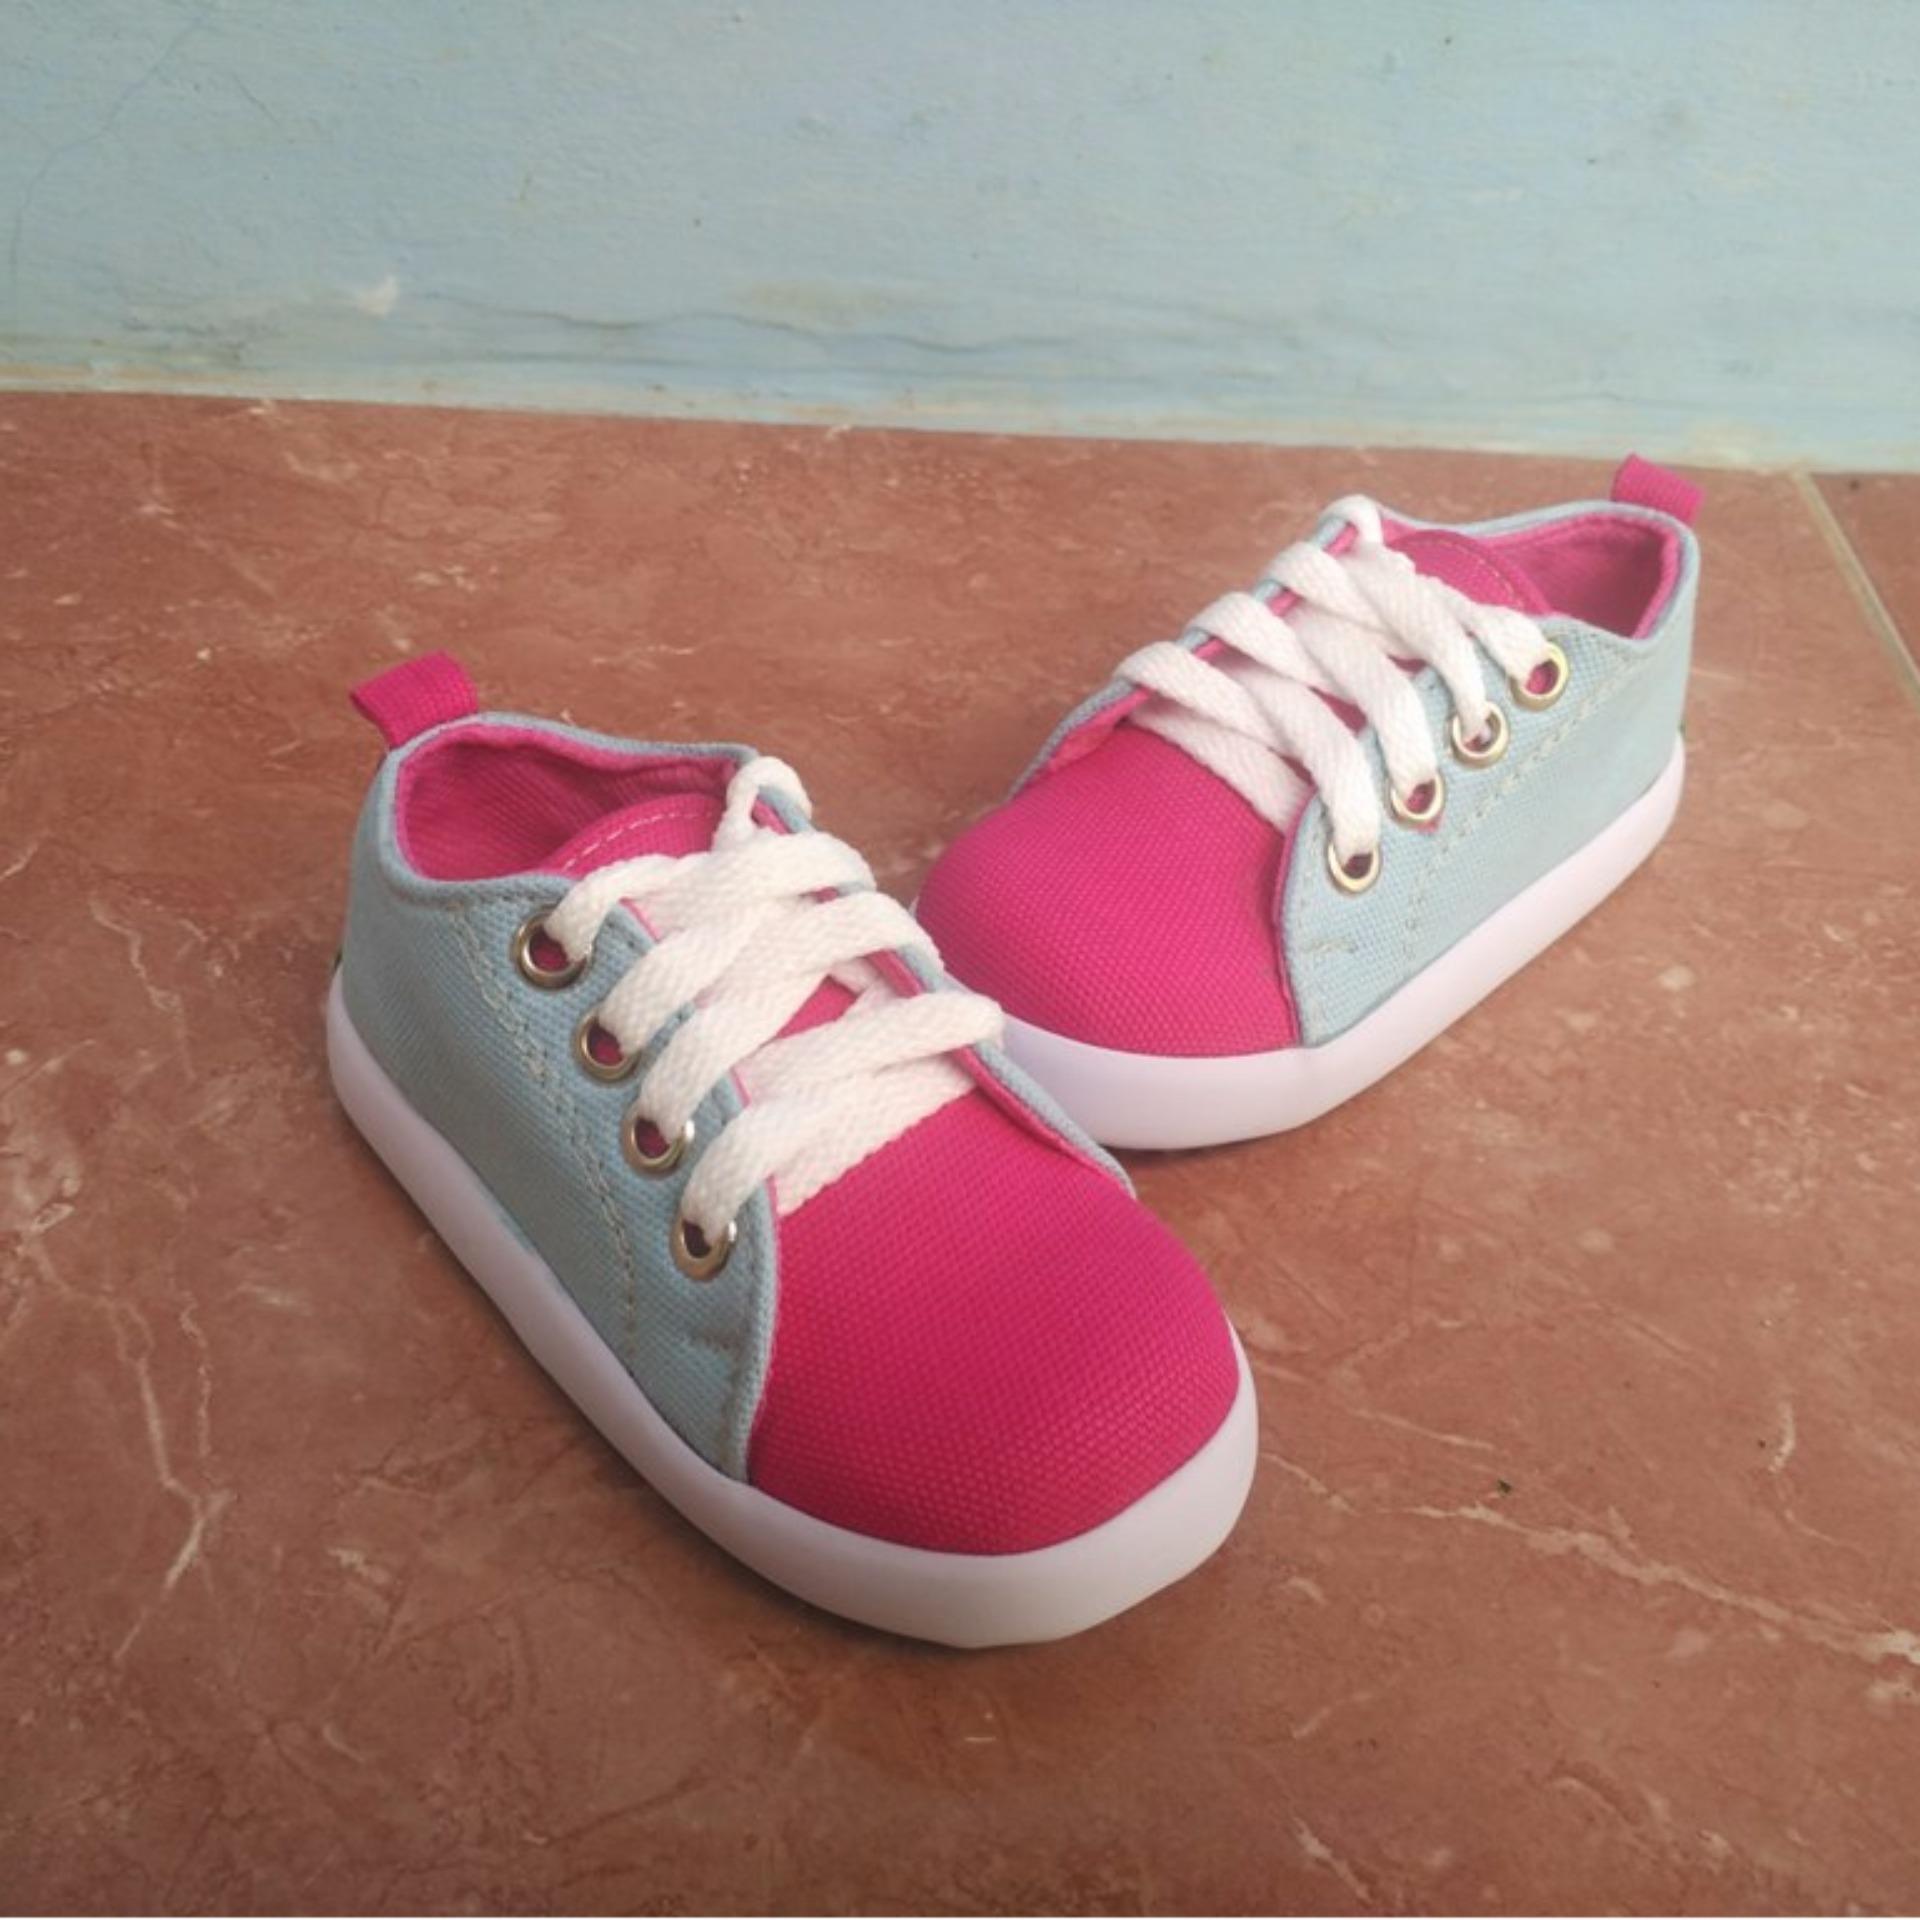 Jual Sepatu Sneaker Anak Perempuan Biru Pink Lucu By Shuku Baru